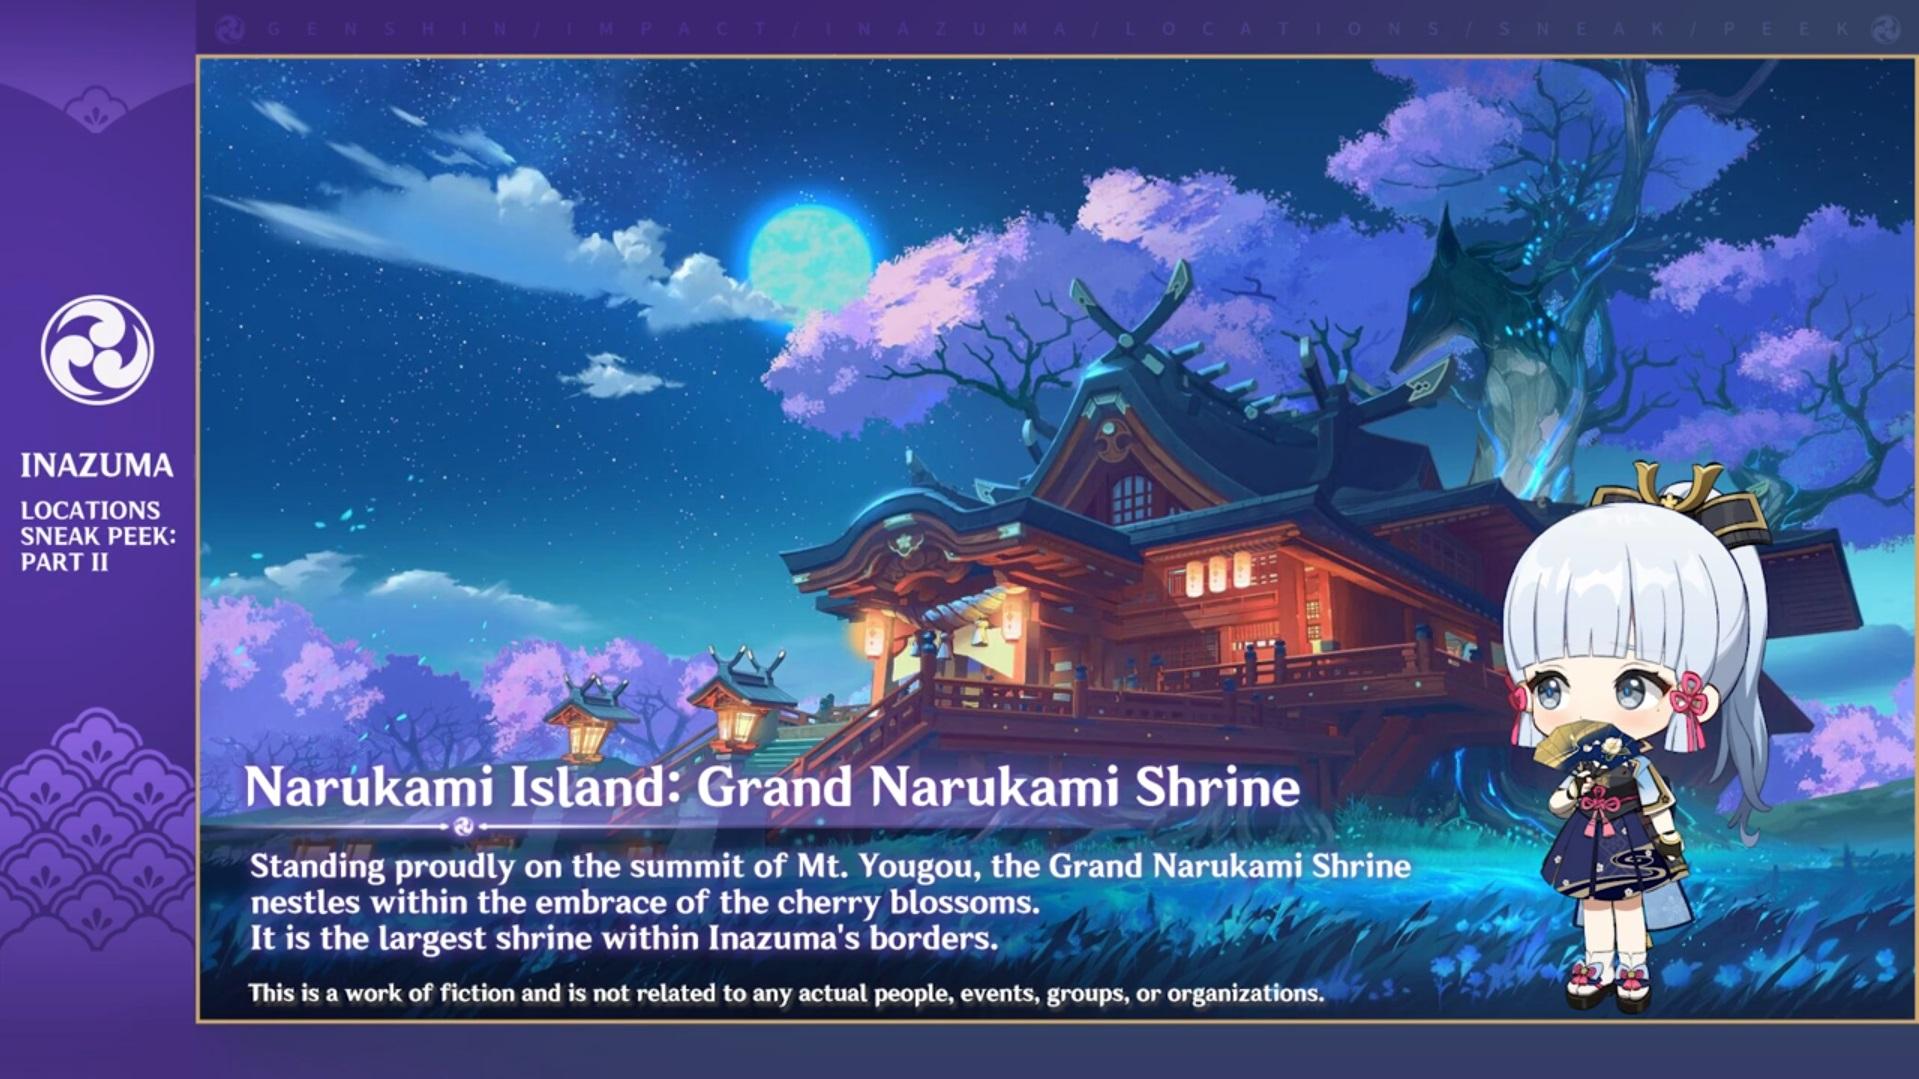 Inazuma update 1.6